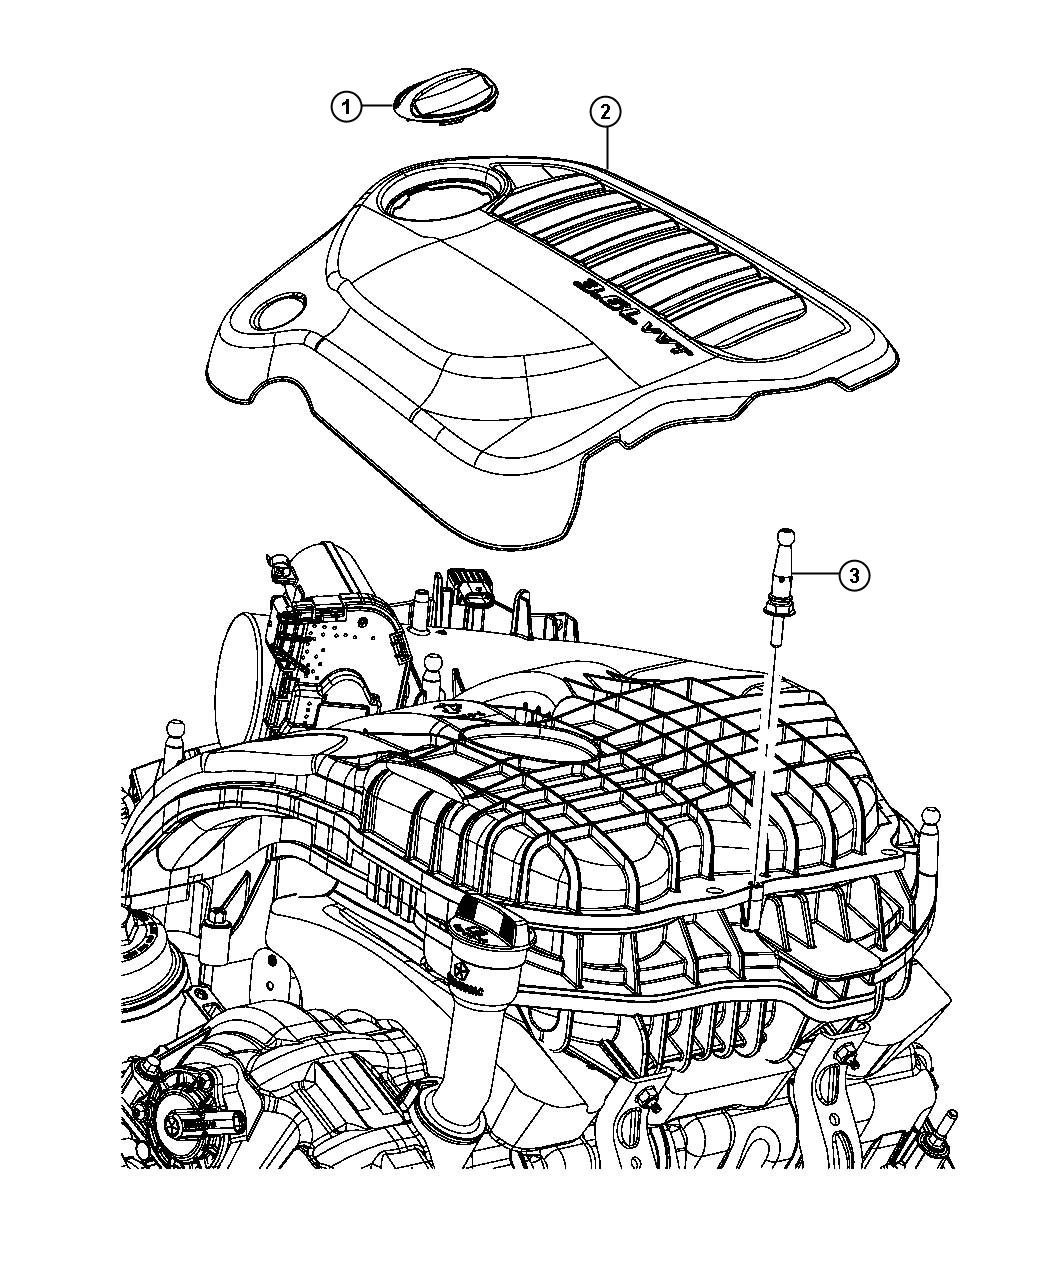 Dodge Avenger Cover Engine R T Enhanced Intake Note